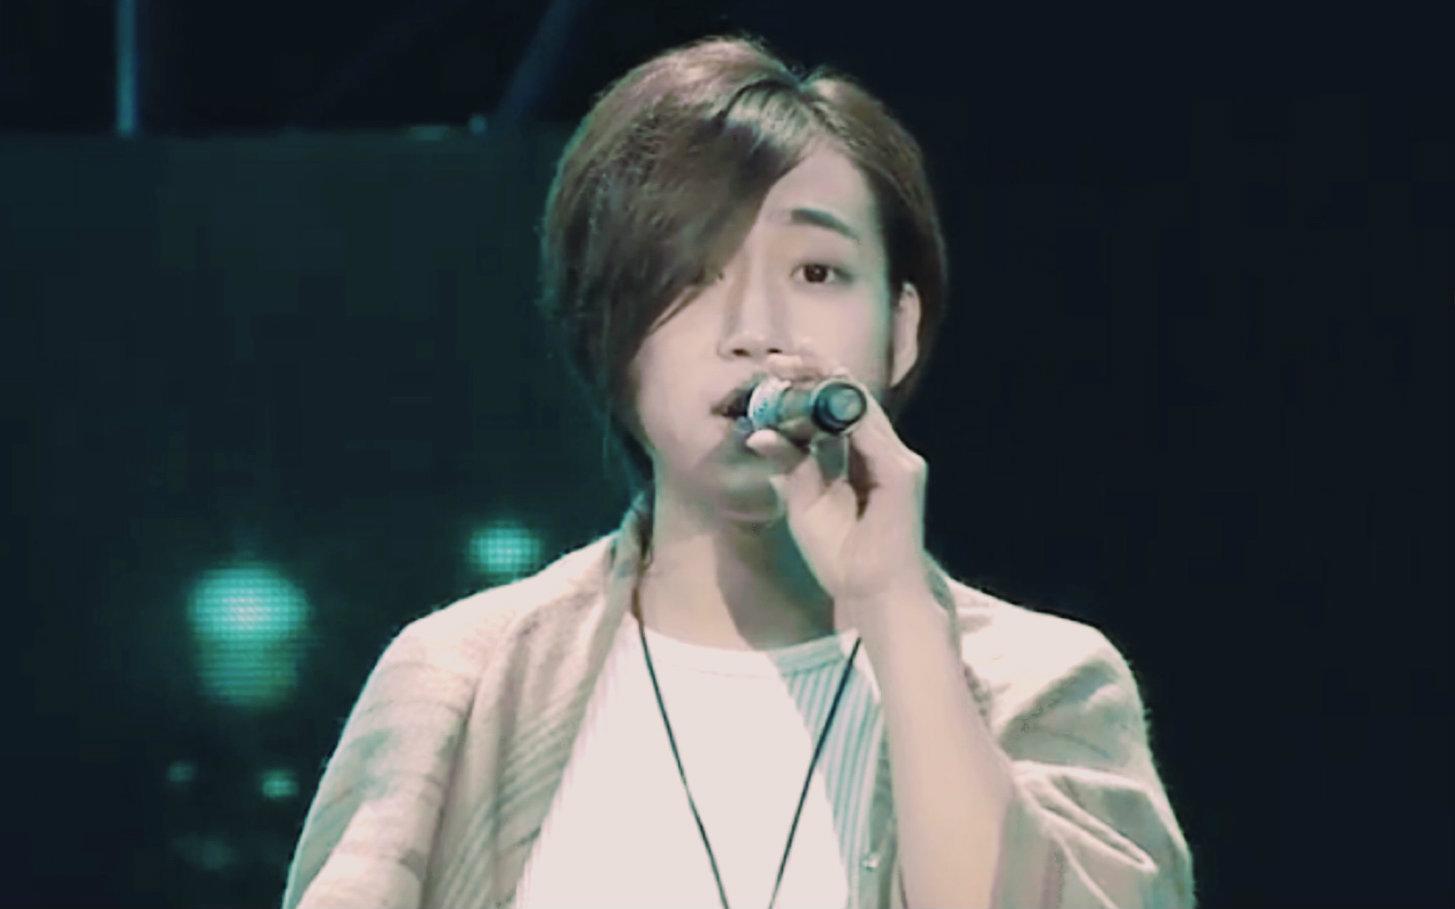 161006 蘑菇動漫音樂節 阿冊 司夏 兔子先生 屏錄_嗶哩嗶哩 (゜-゜)つロ 干杯~-bilibili